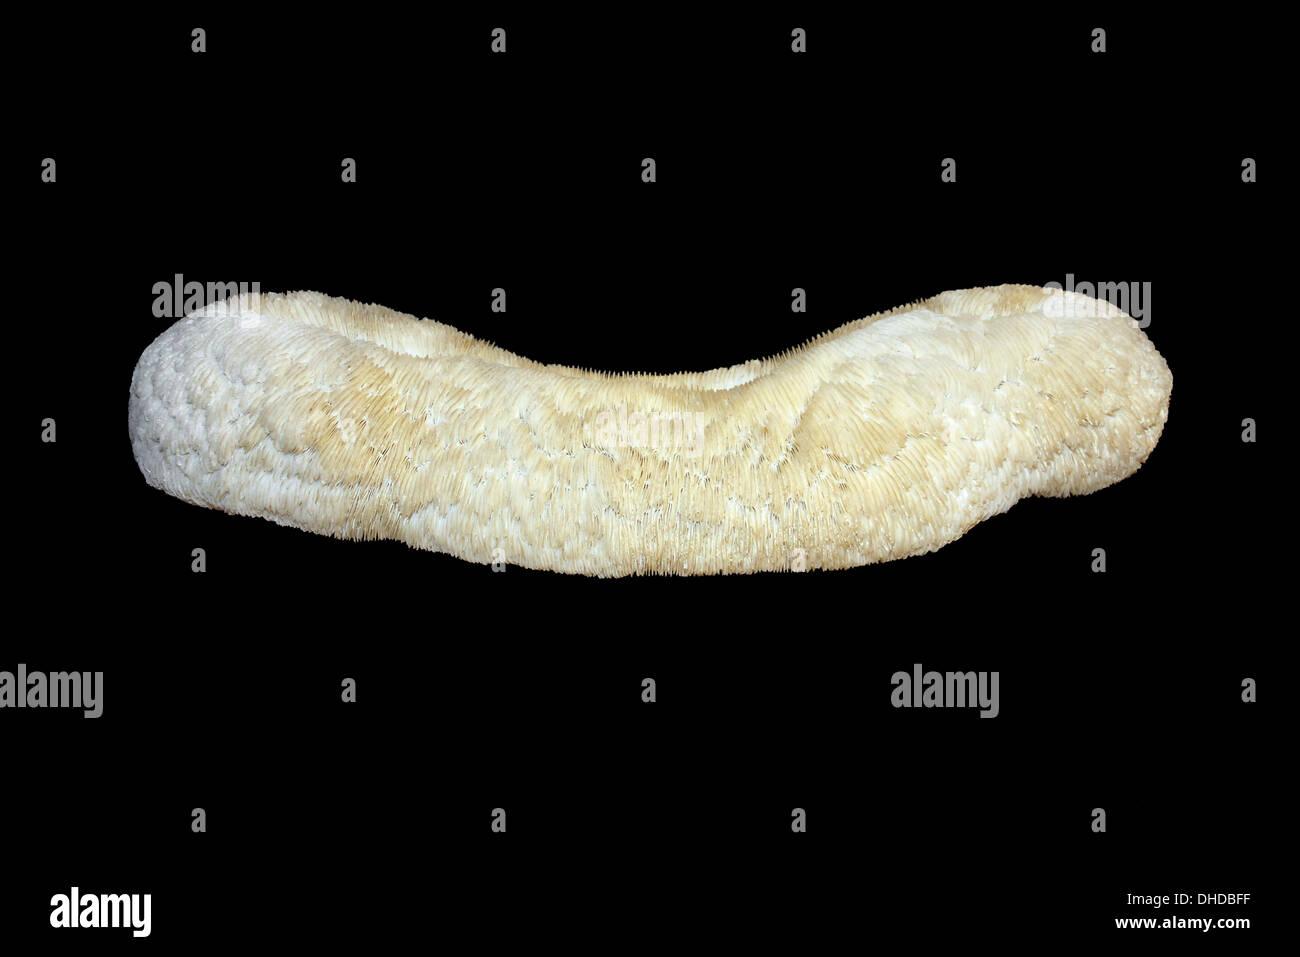 Atlantic Mushroom Coral (a.k.a. Tongue Coral) Herpolitha limax - Stock Image